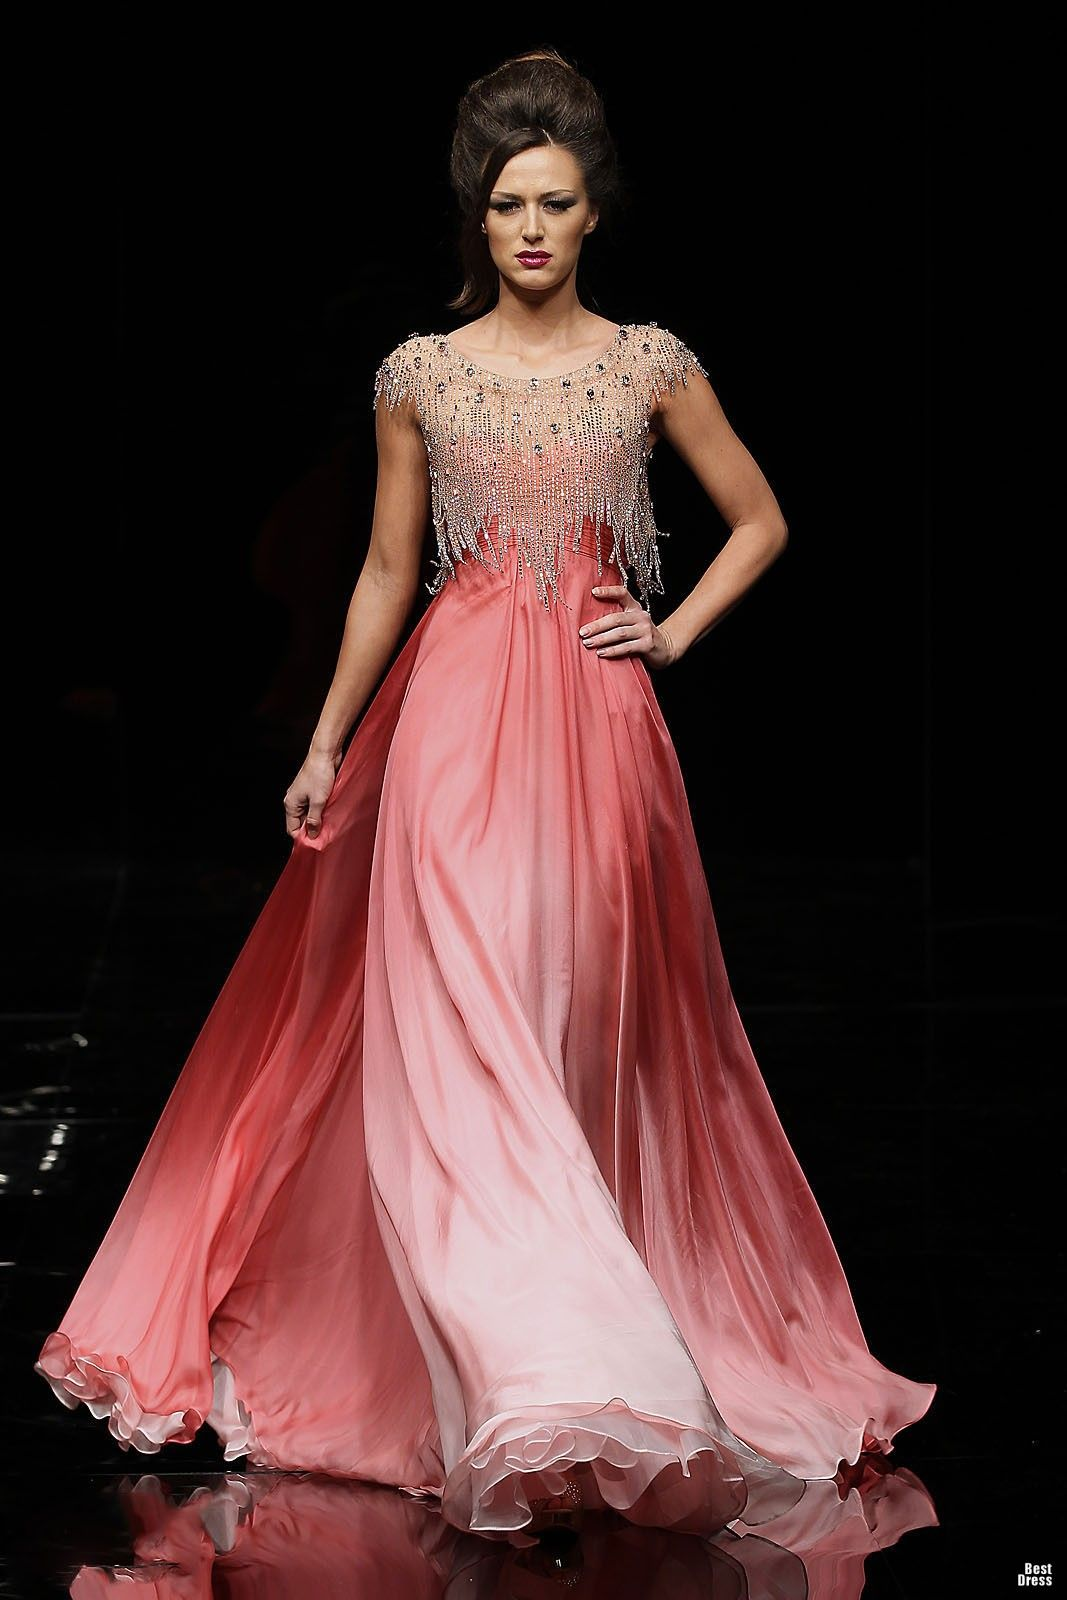 Hanna touma evening gowns cocktail attire pinterest haute